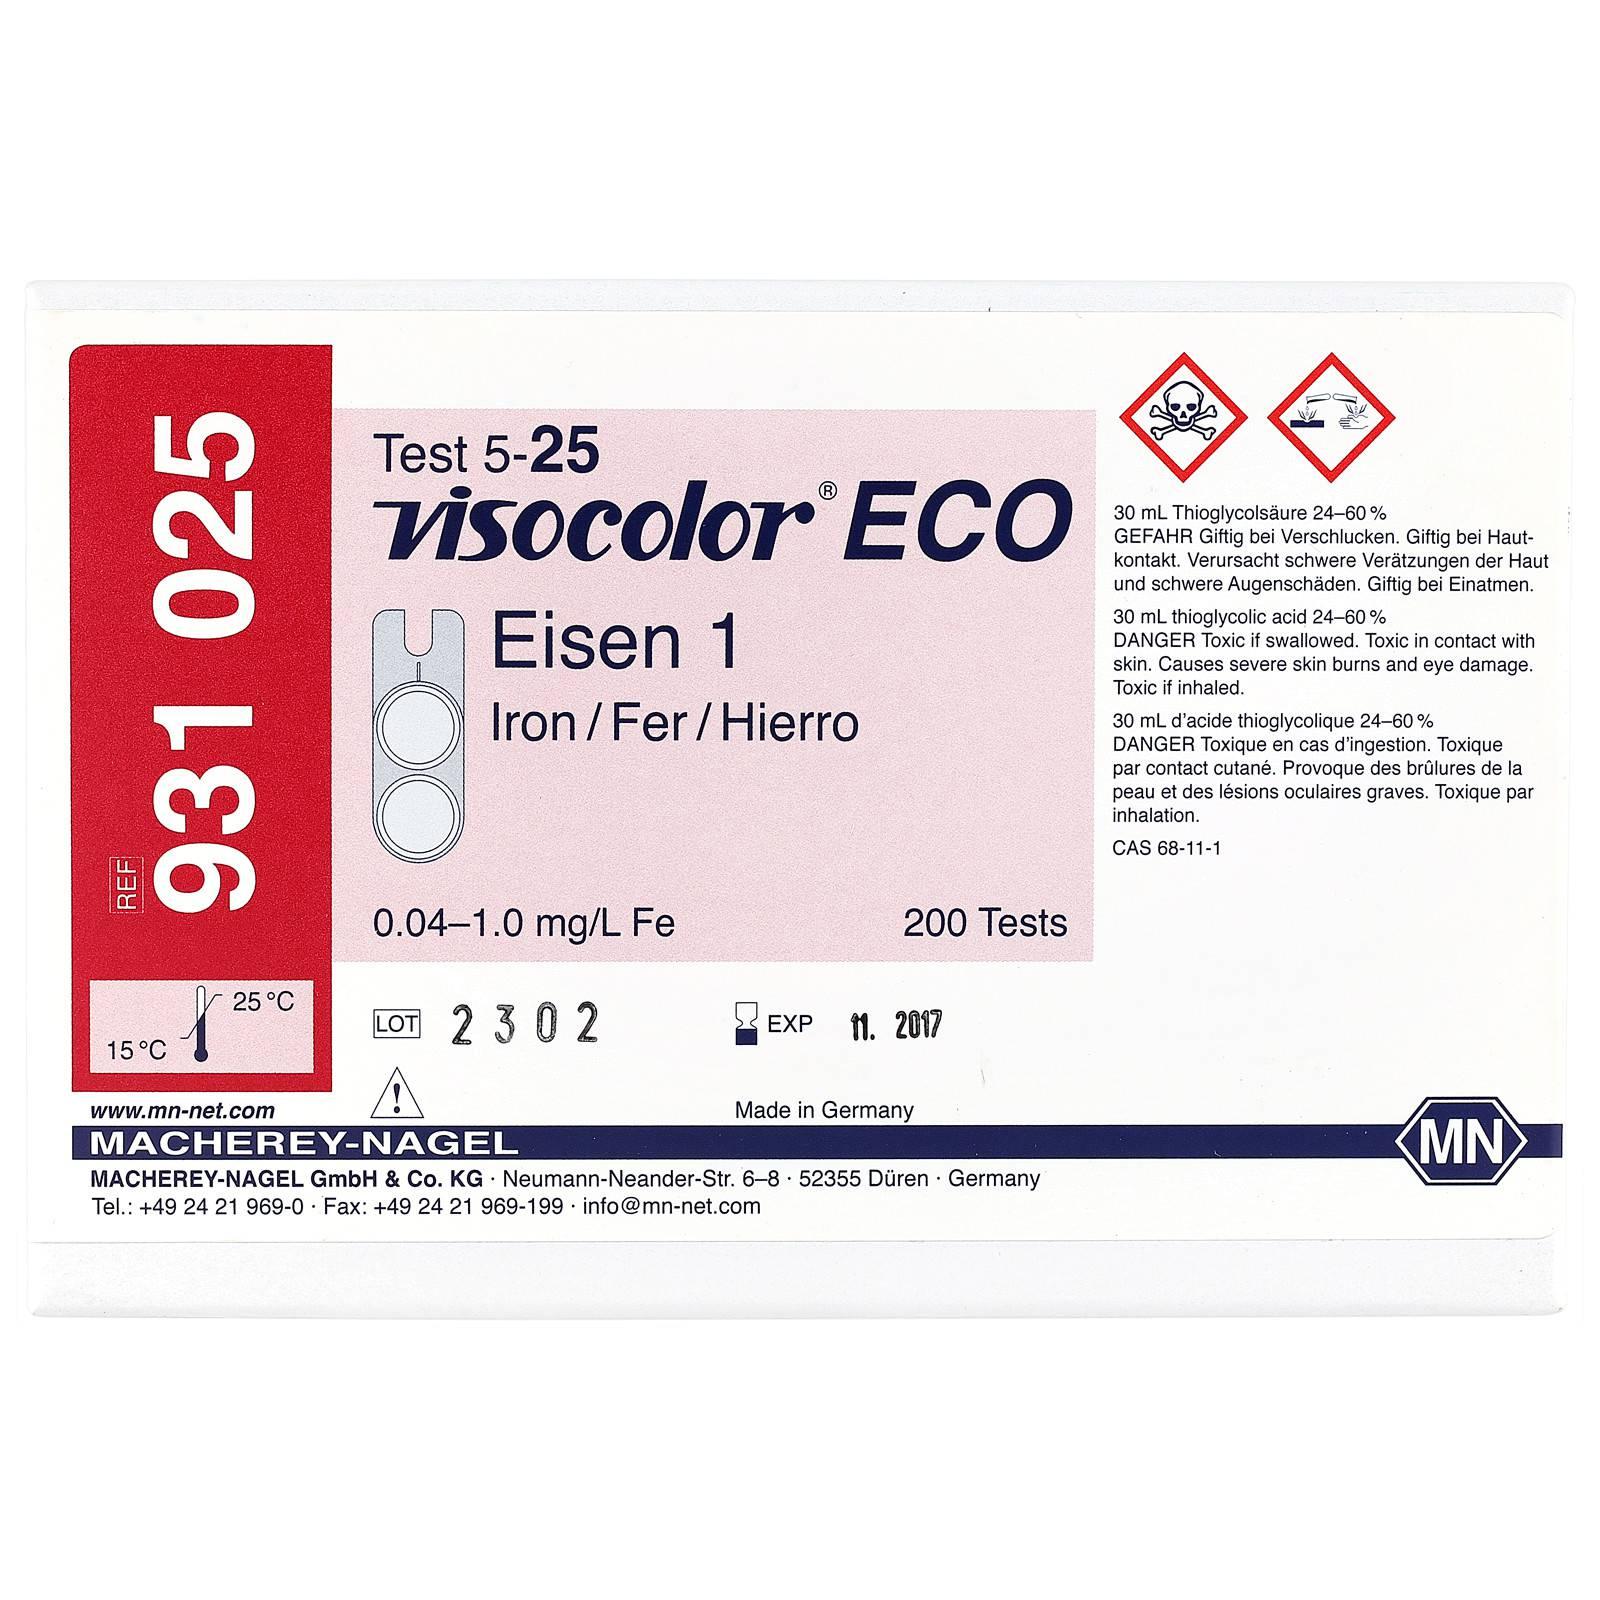 Macherey-Nagel - Visocolor ECO - Eisen 1